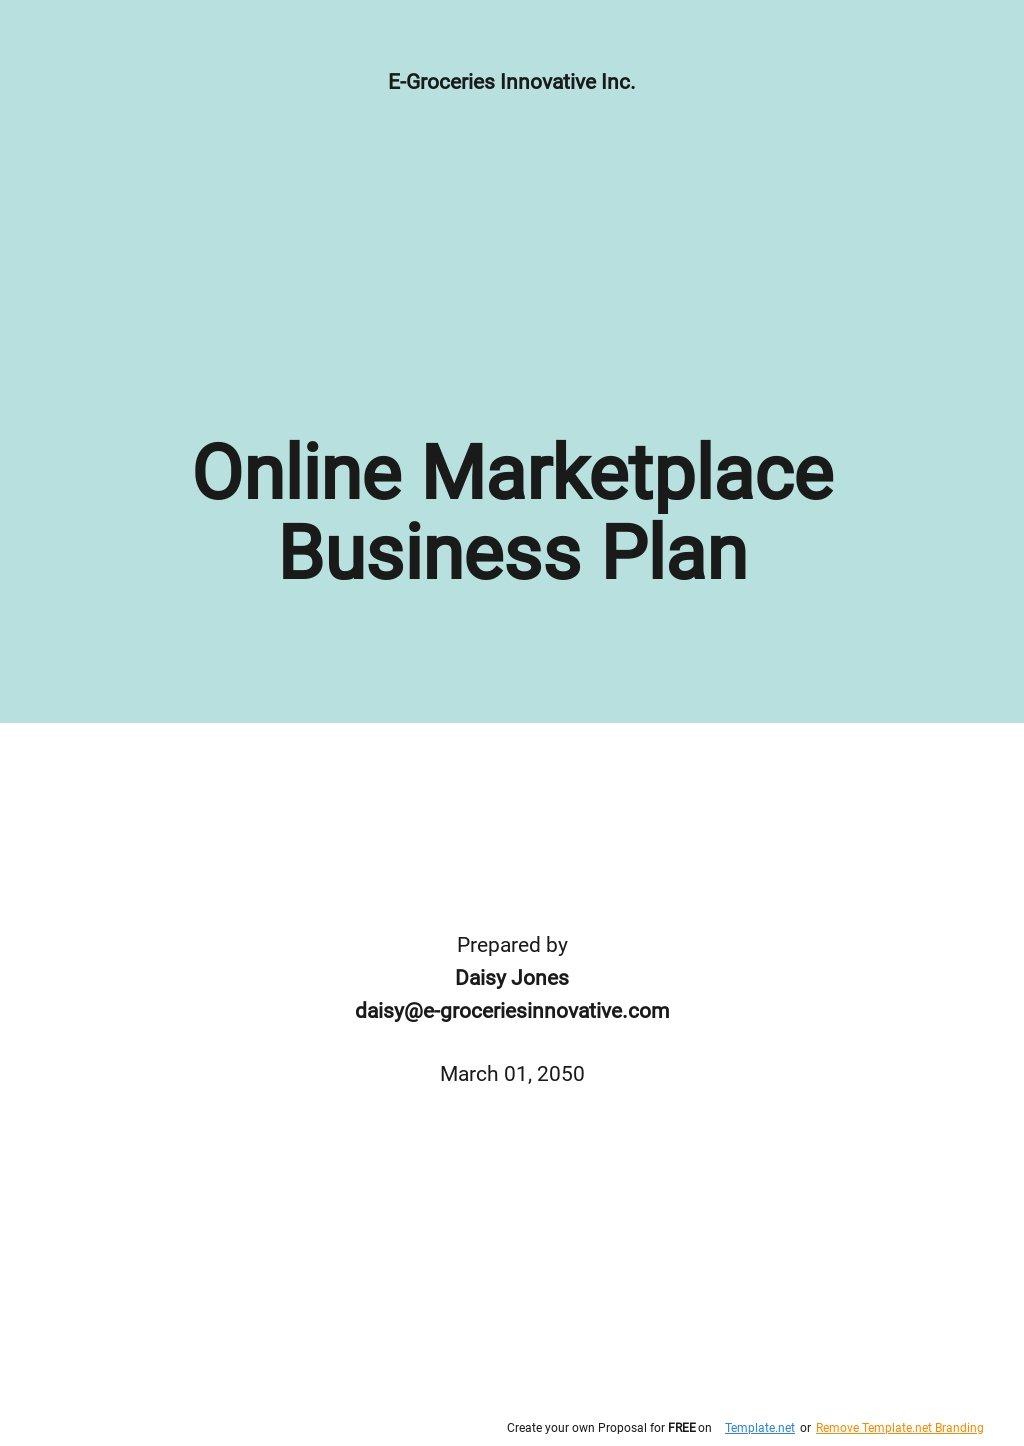 Online Marketplace Business Plan Template.jpe